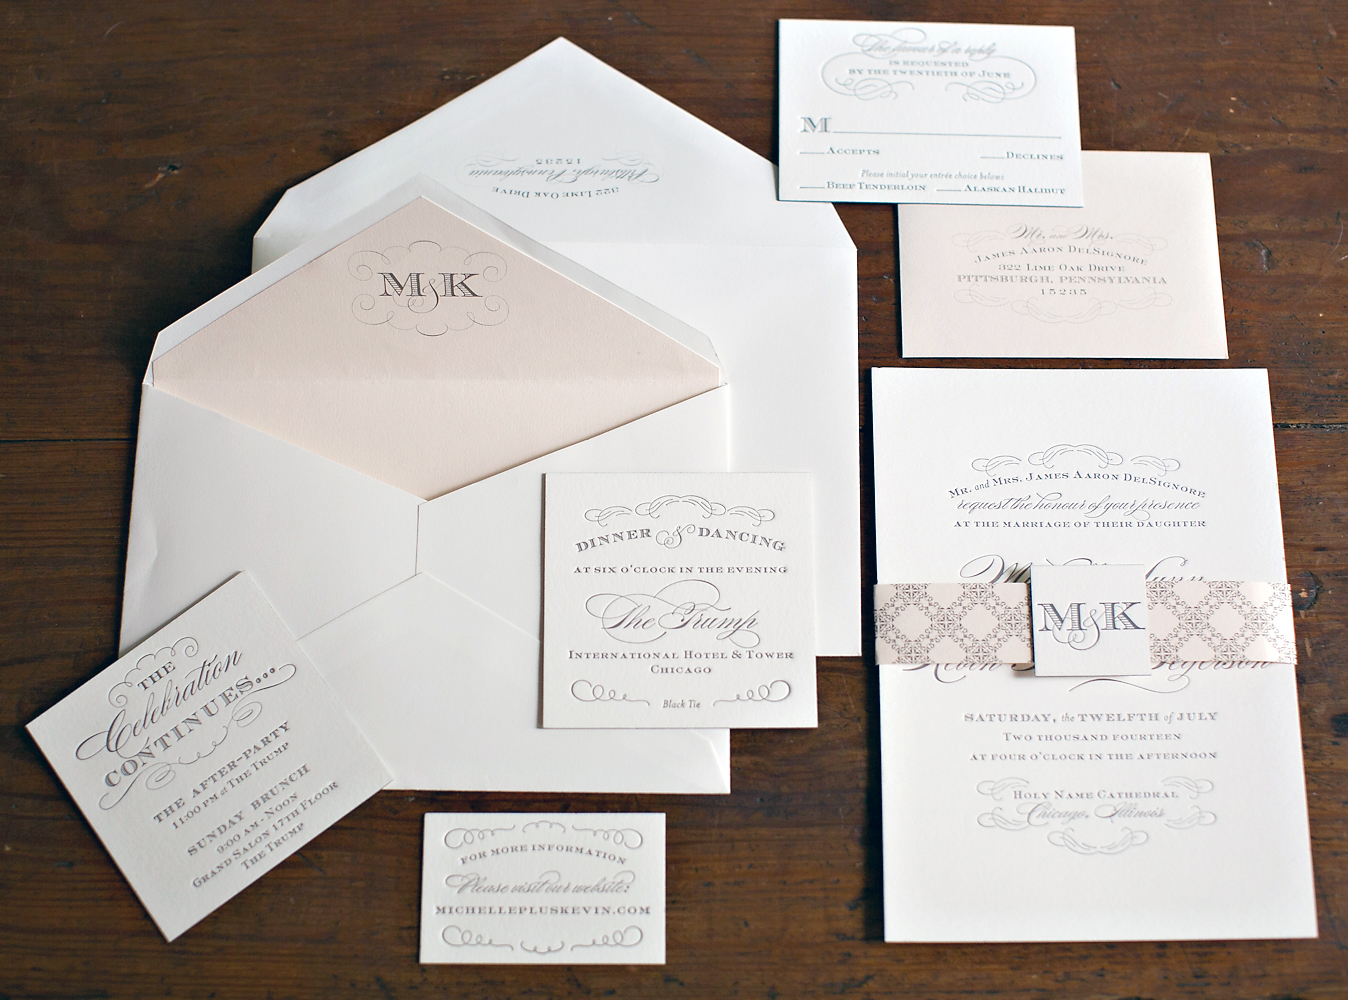 Nico and lala chicago trump hotel wedding invitation stopboris Image collections